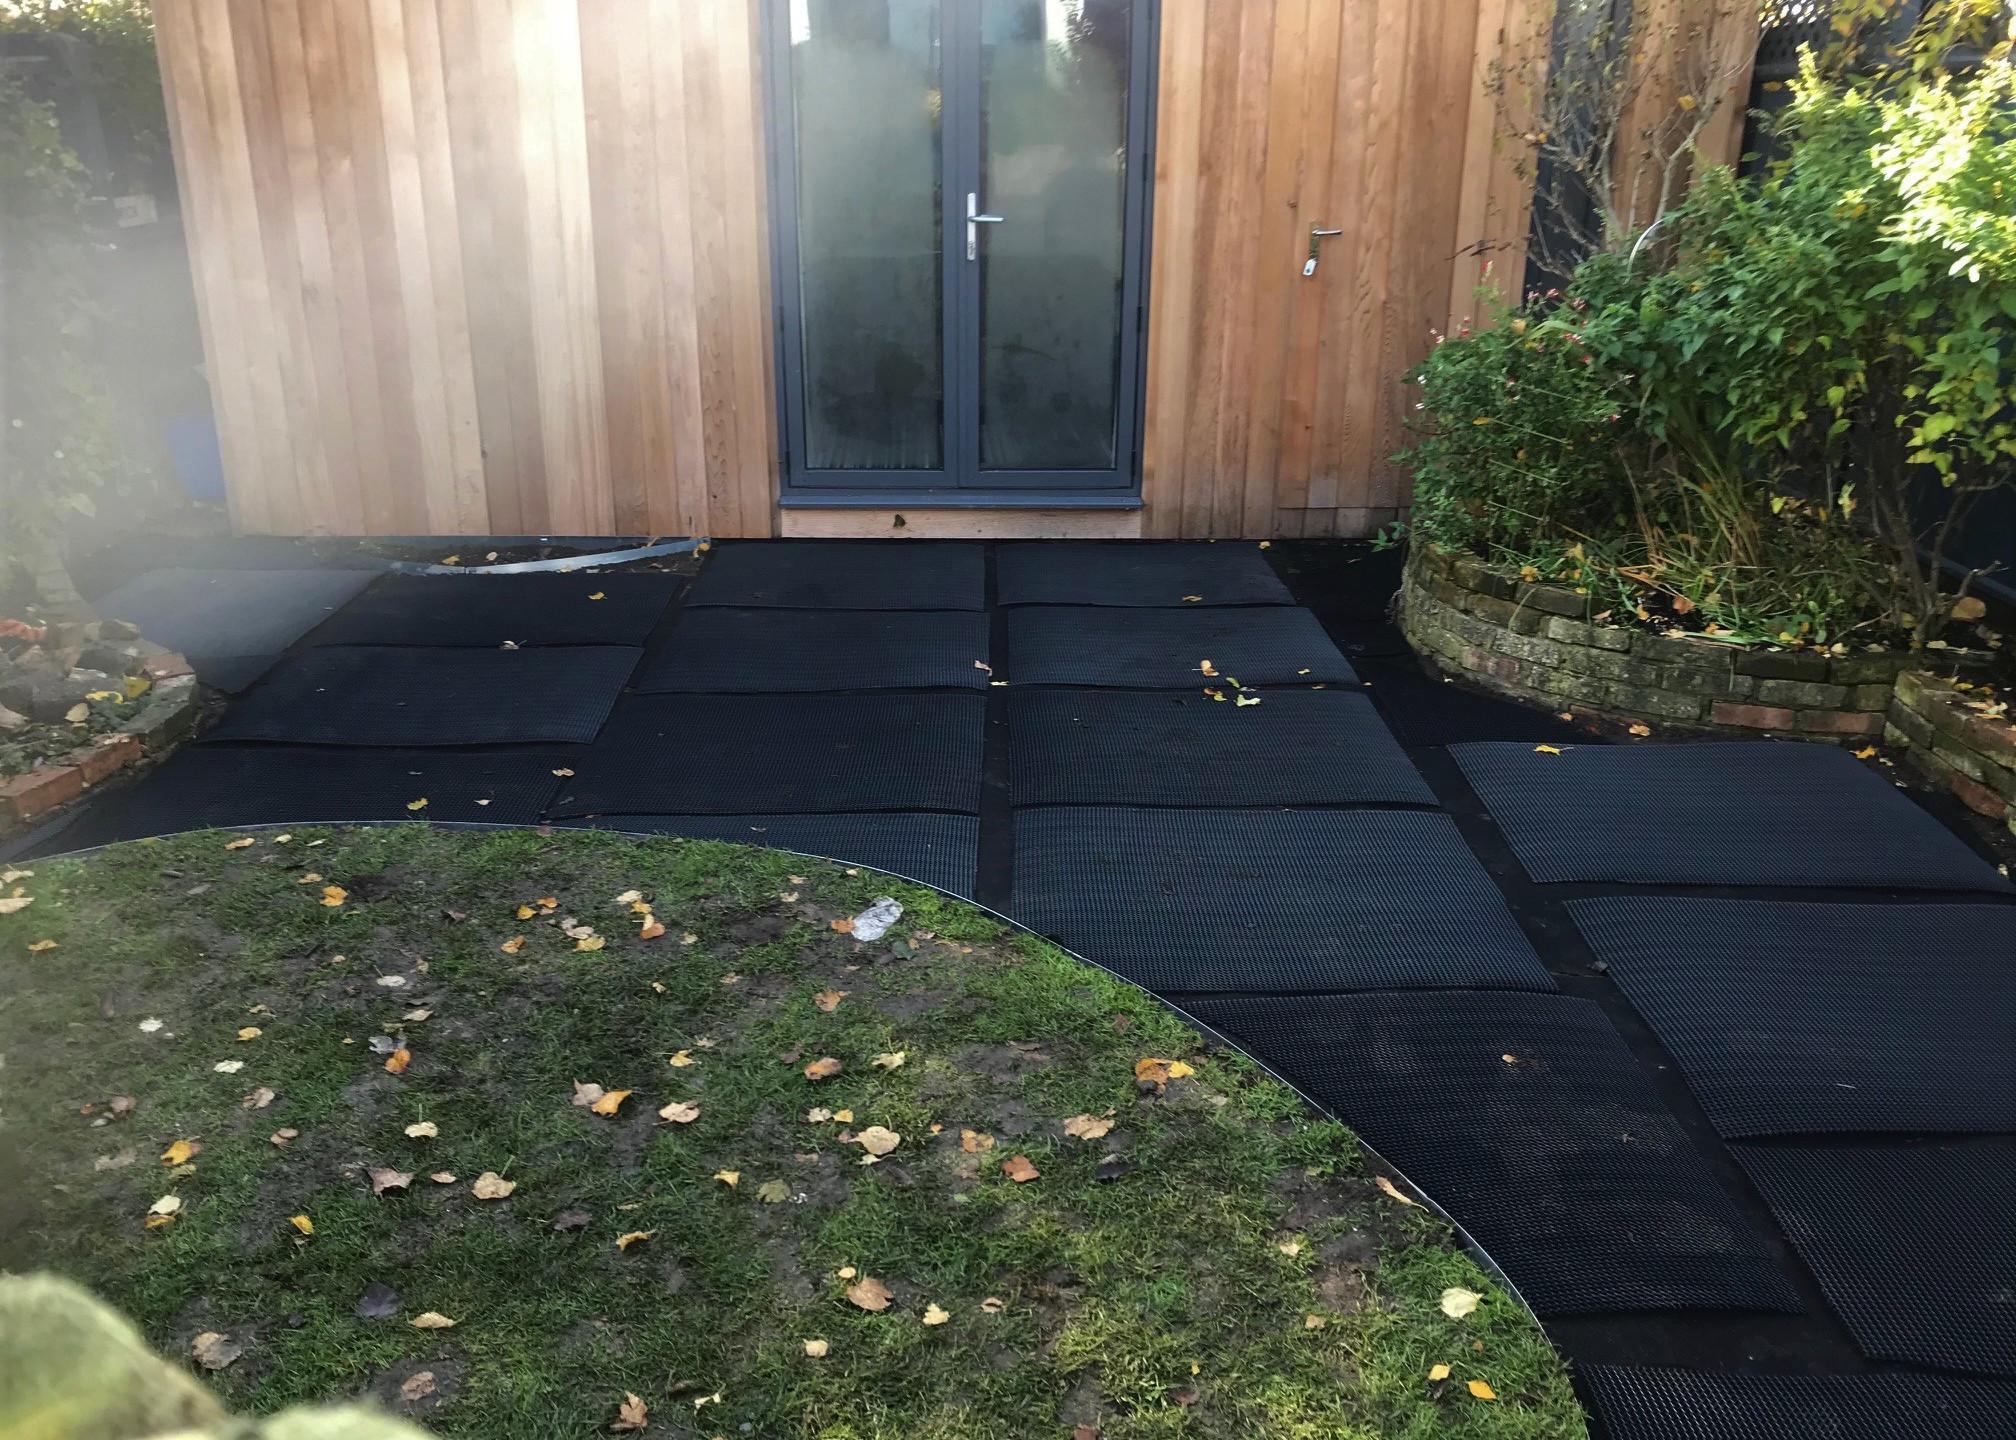 Path with matting